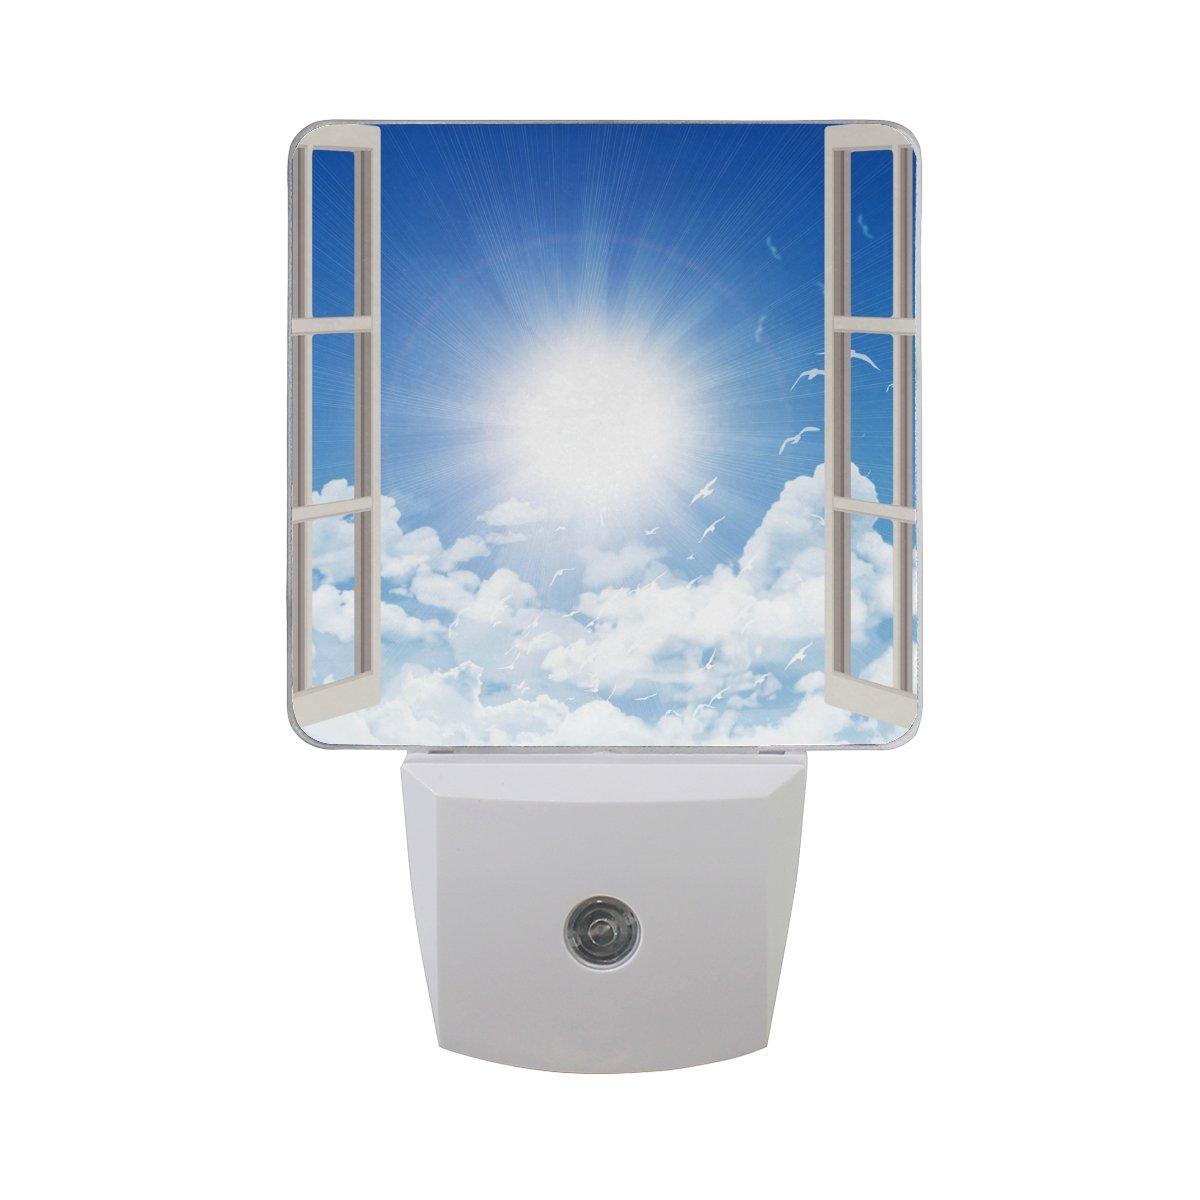 2 Pack 0.5W Open Window Printing Plug-in LED Night Light Lamp with Dusk to Dawn Sensor for Bedroom, Bathroom, Hallway, Stairways